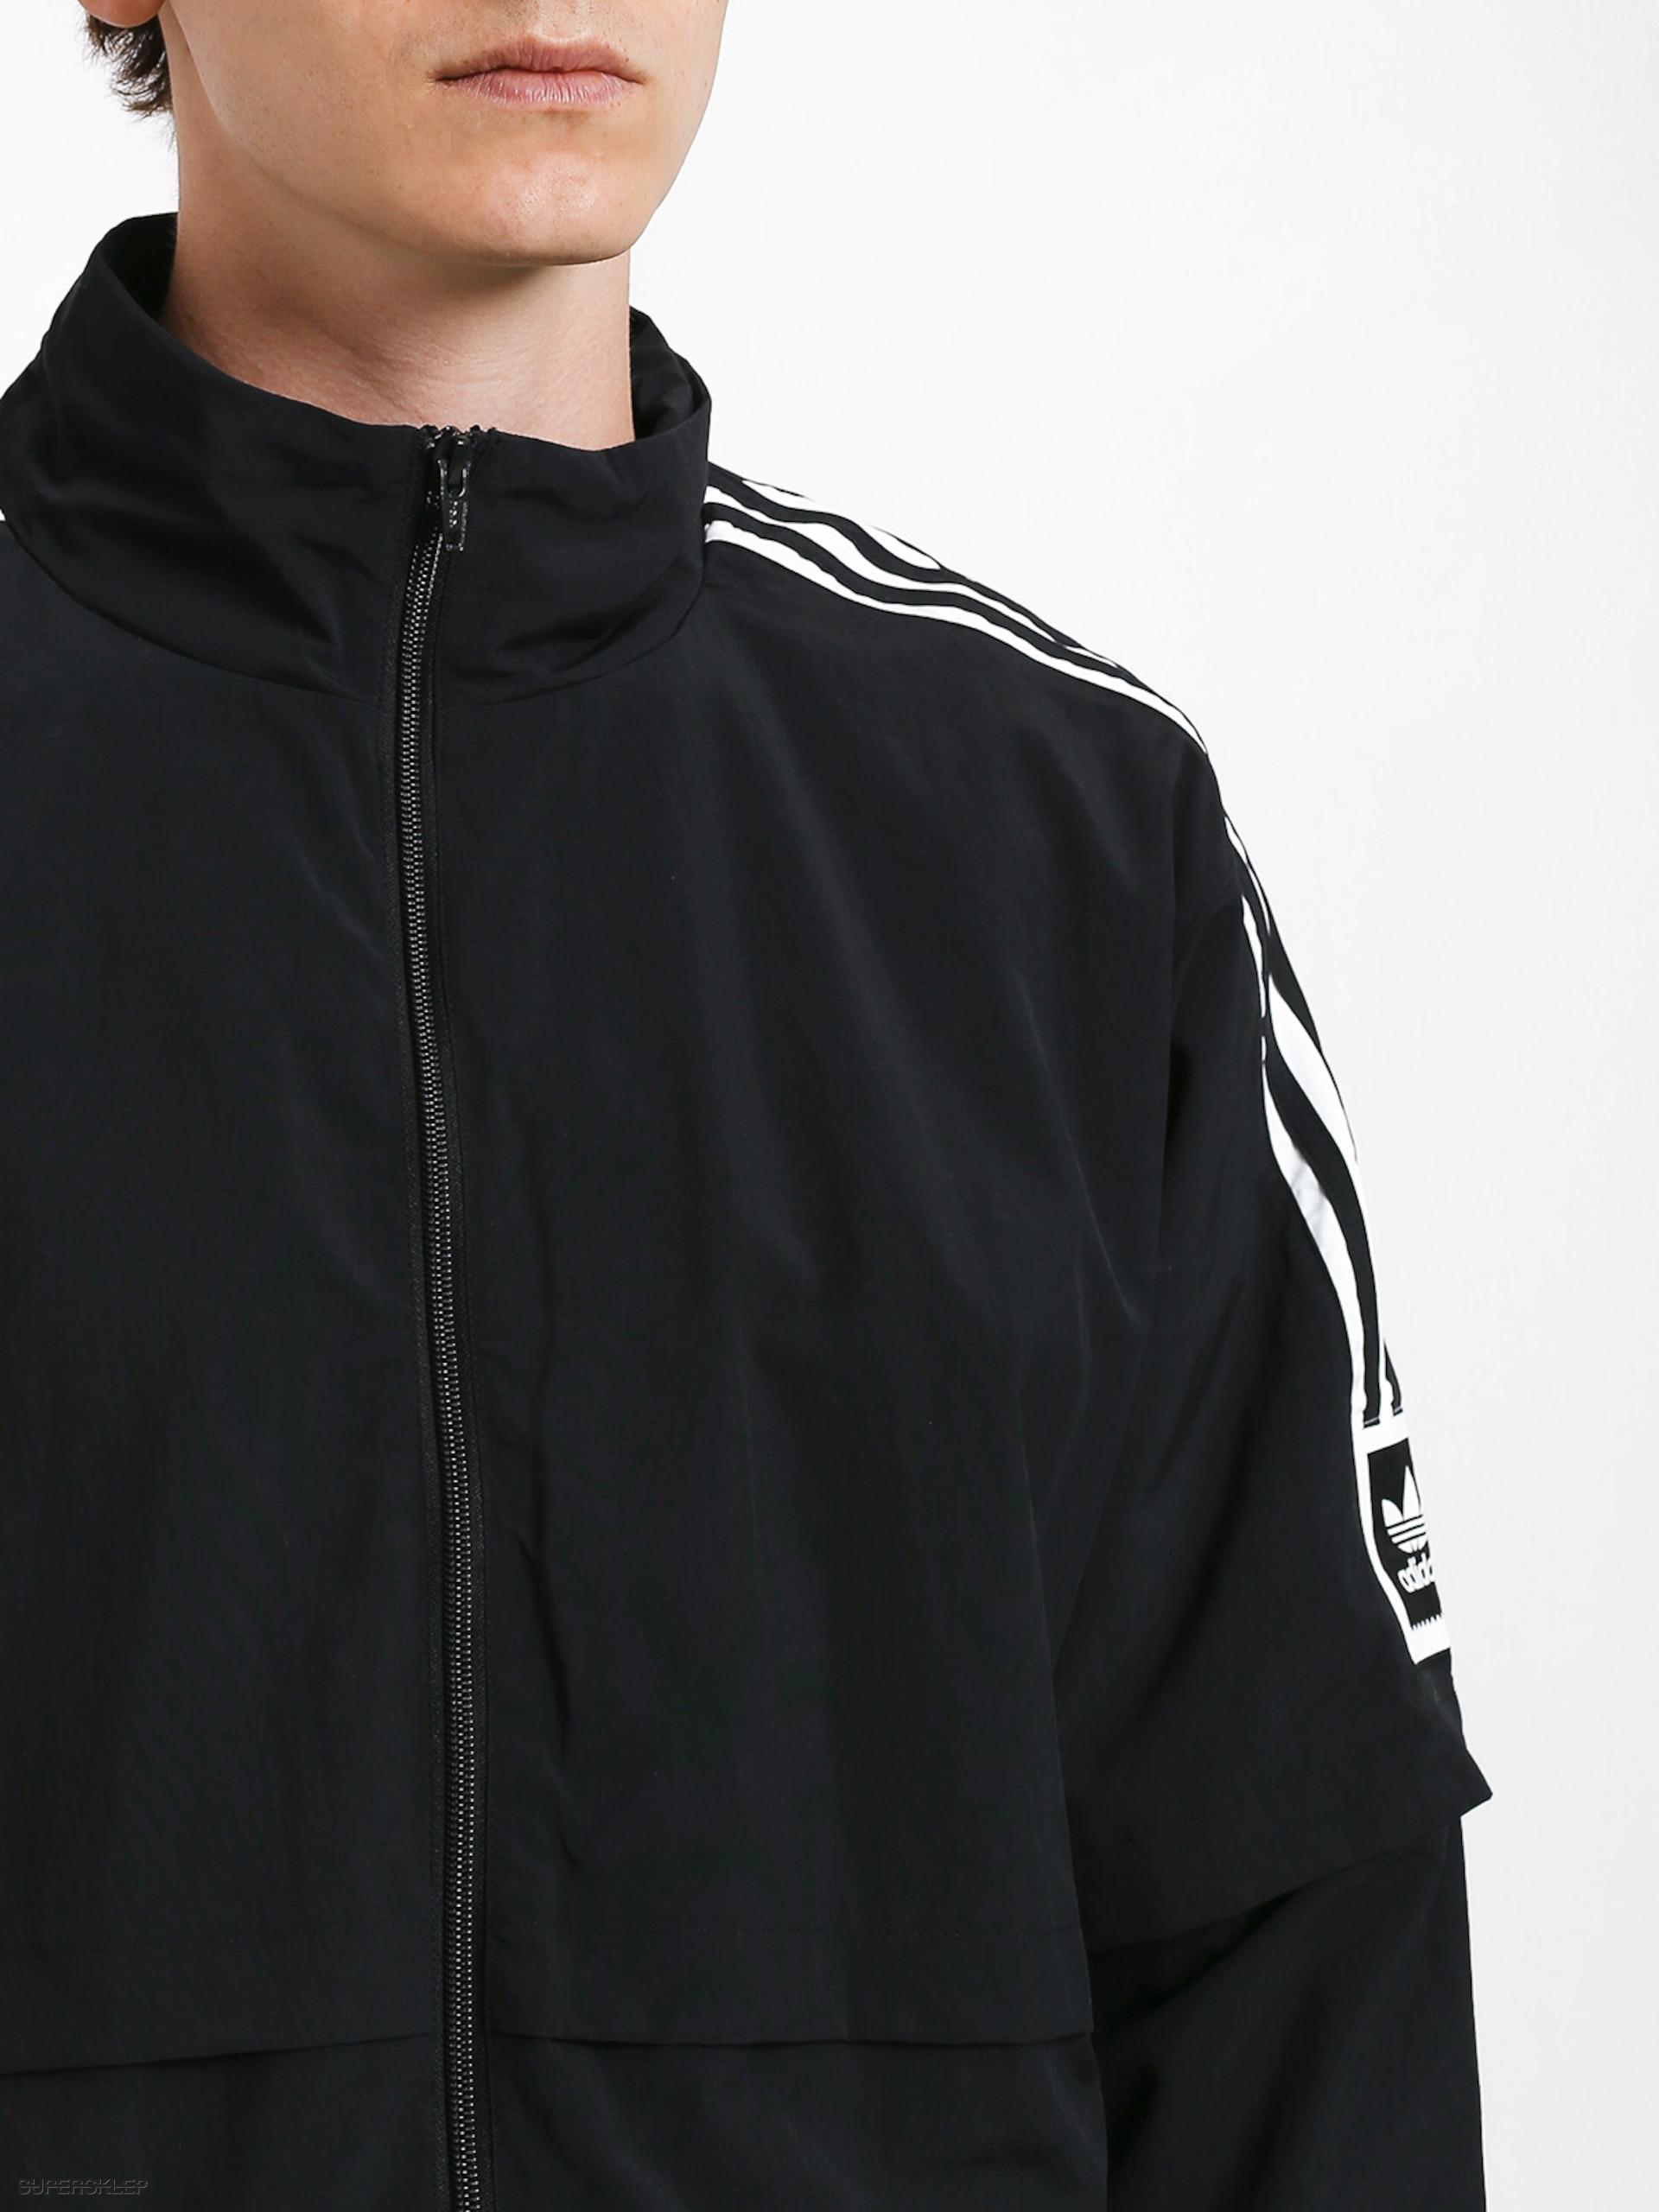 Kurtka adidas Stdrd 20 (blackwhite)